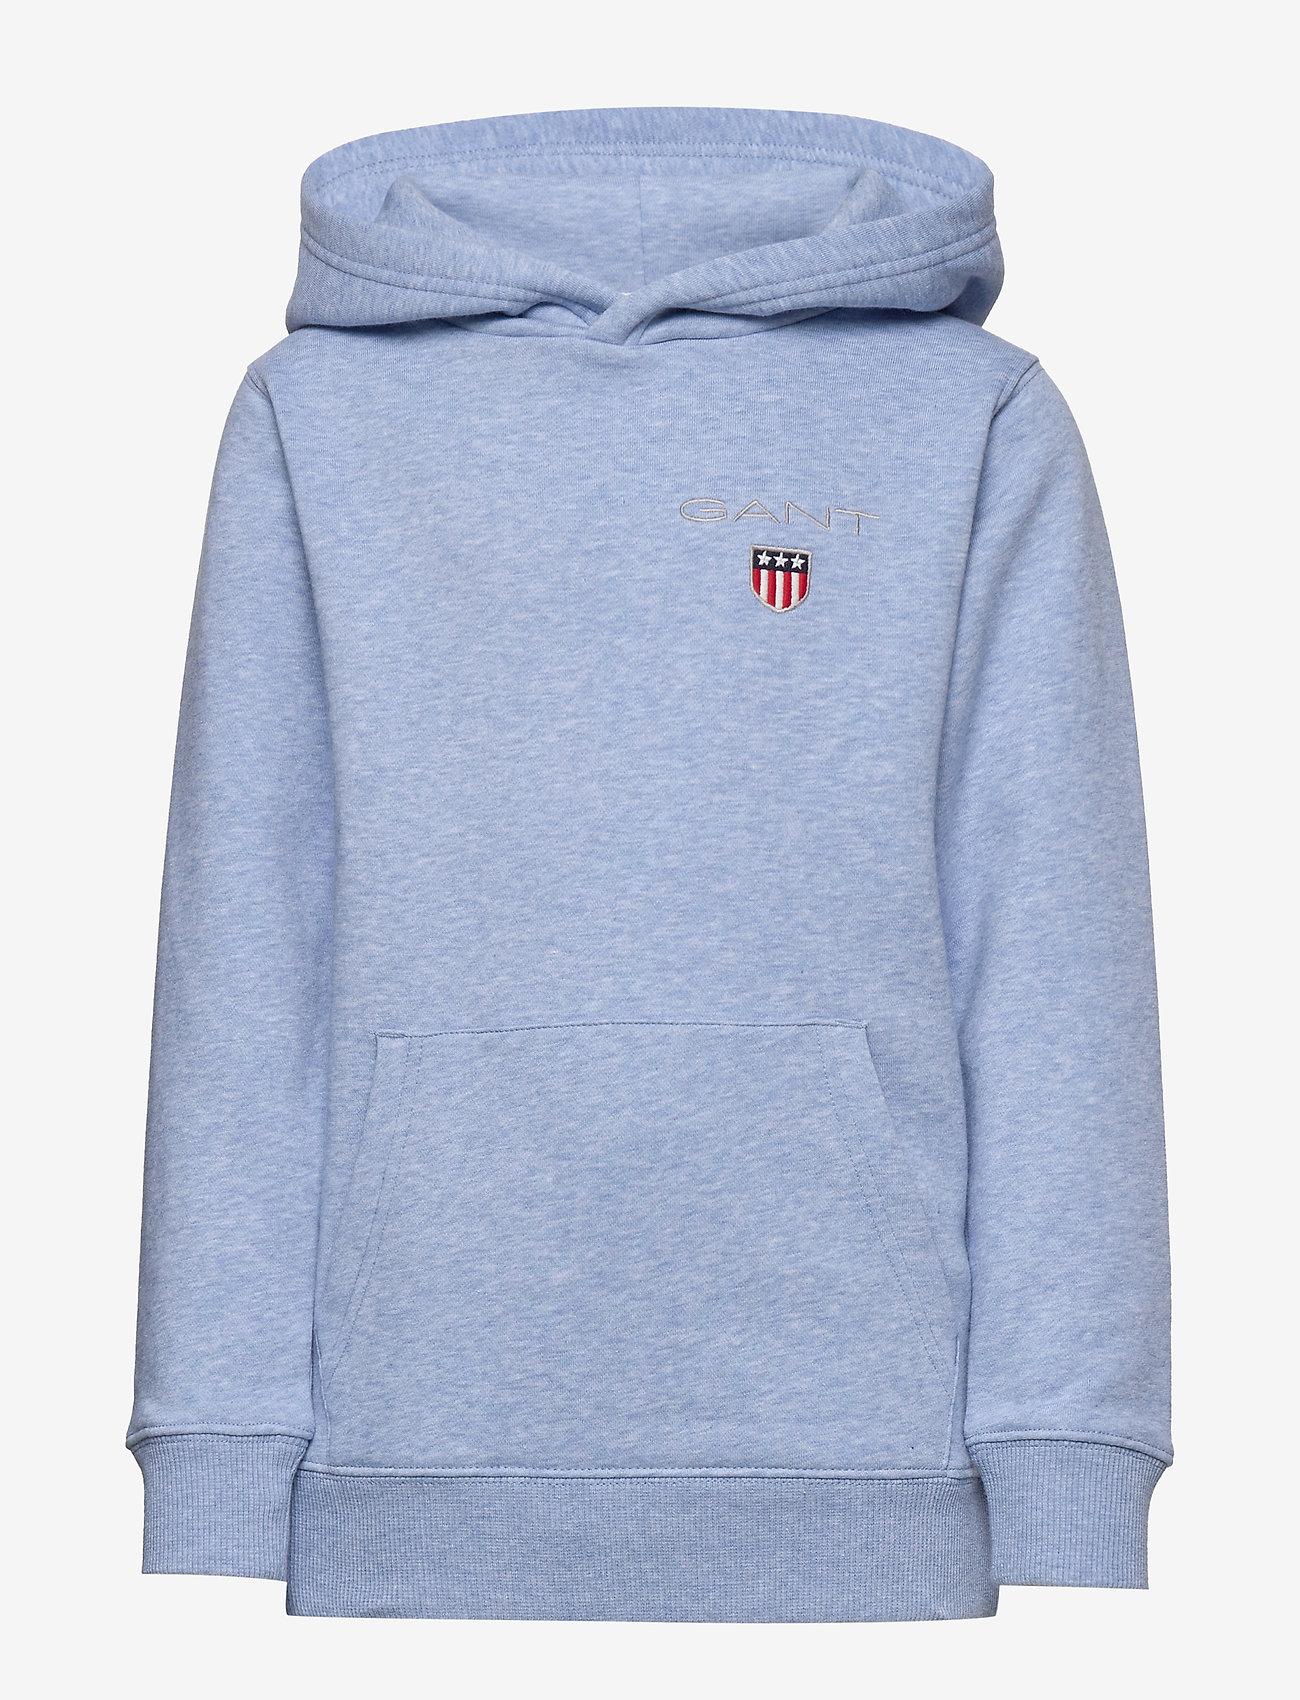 GANT - D1. MEDIUM SHIELD SWEAT HOODIE - hoodies - frost blue mel - 0